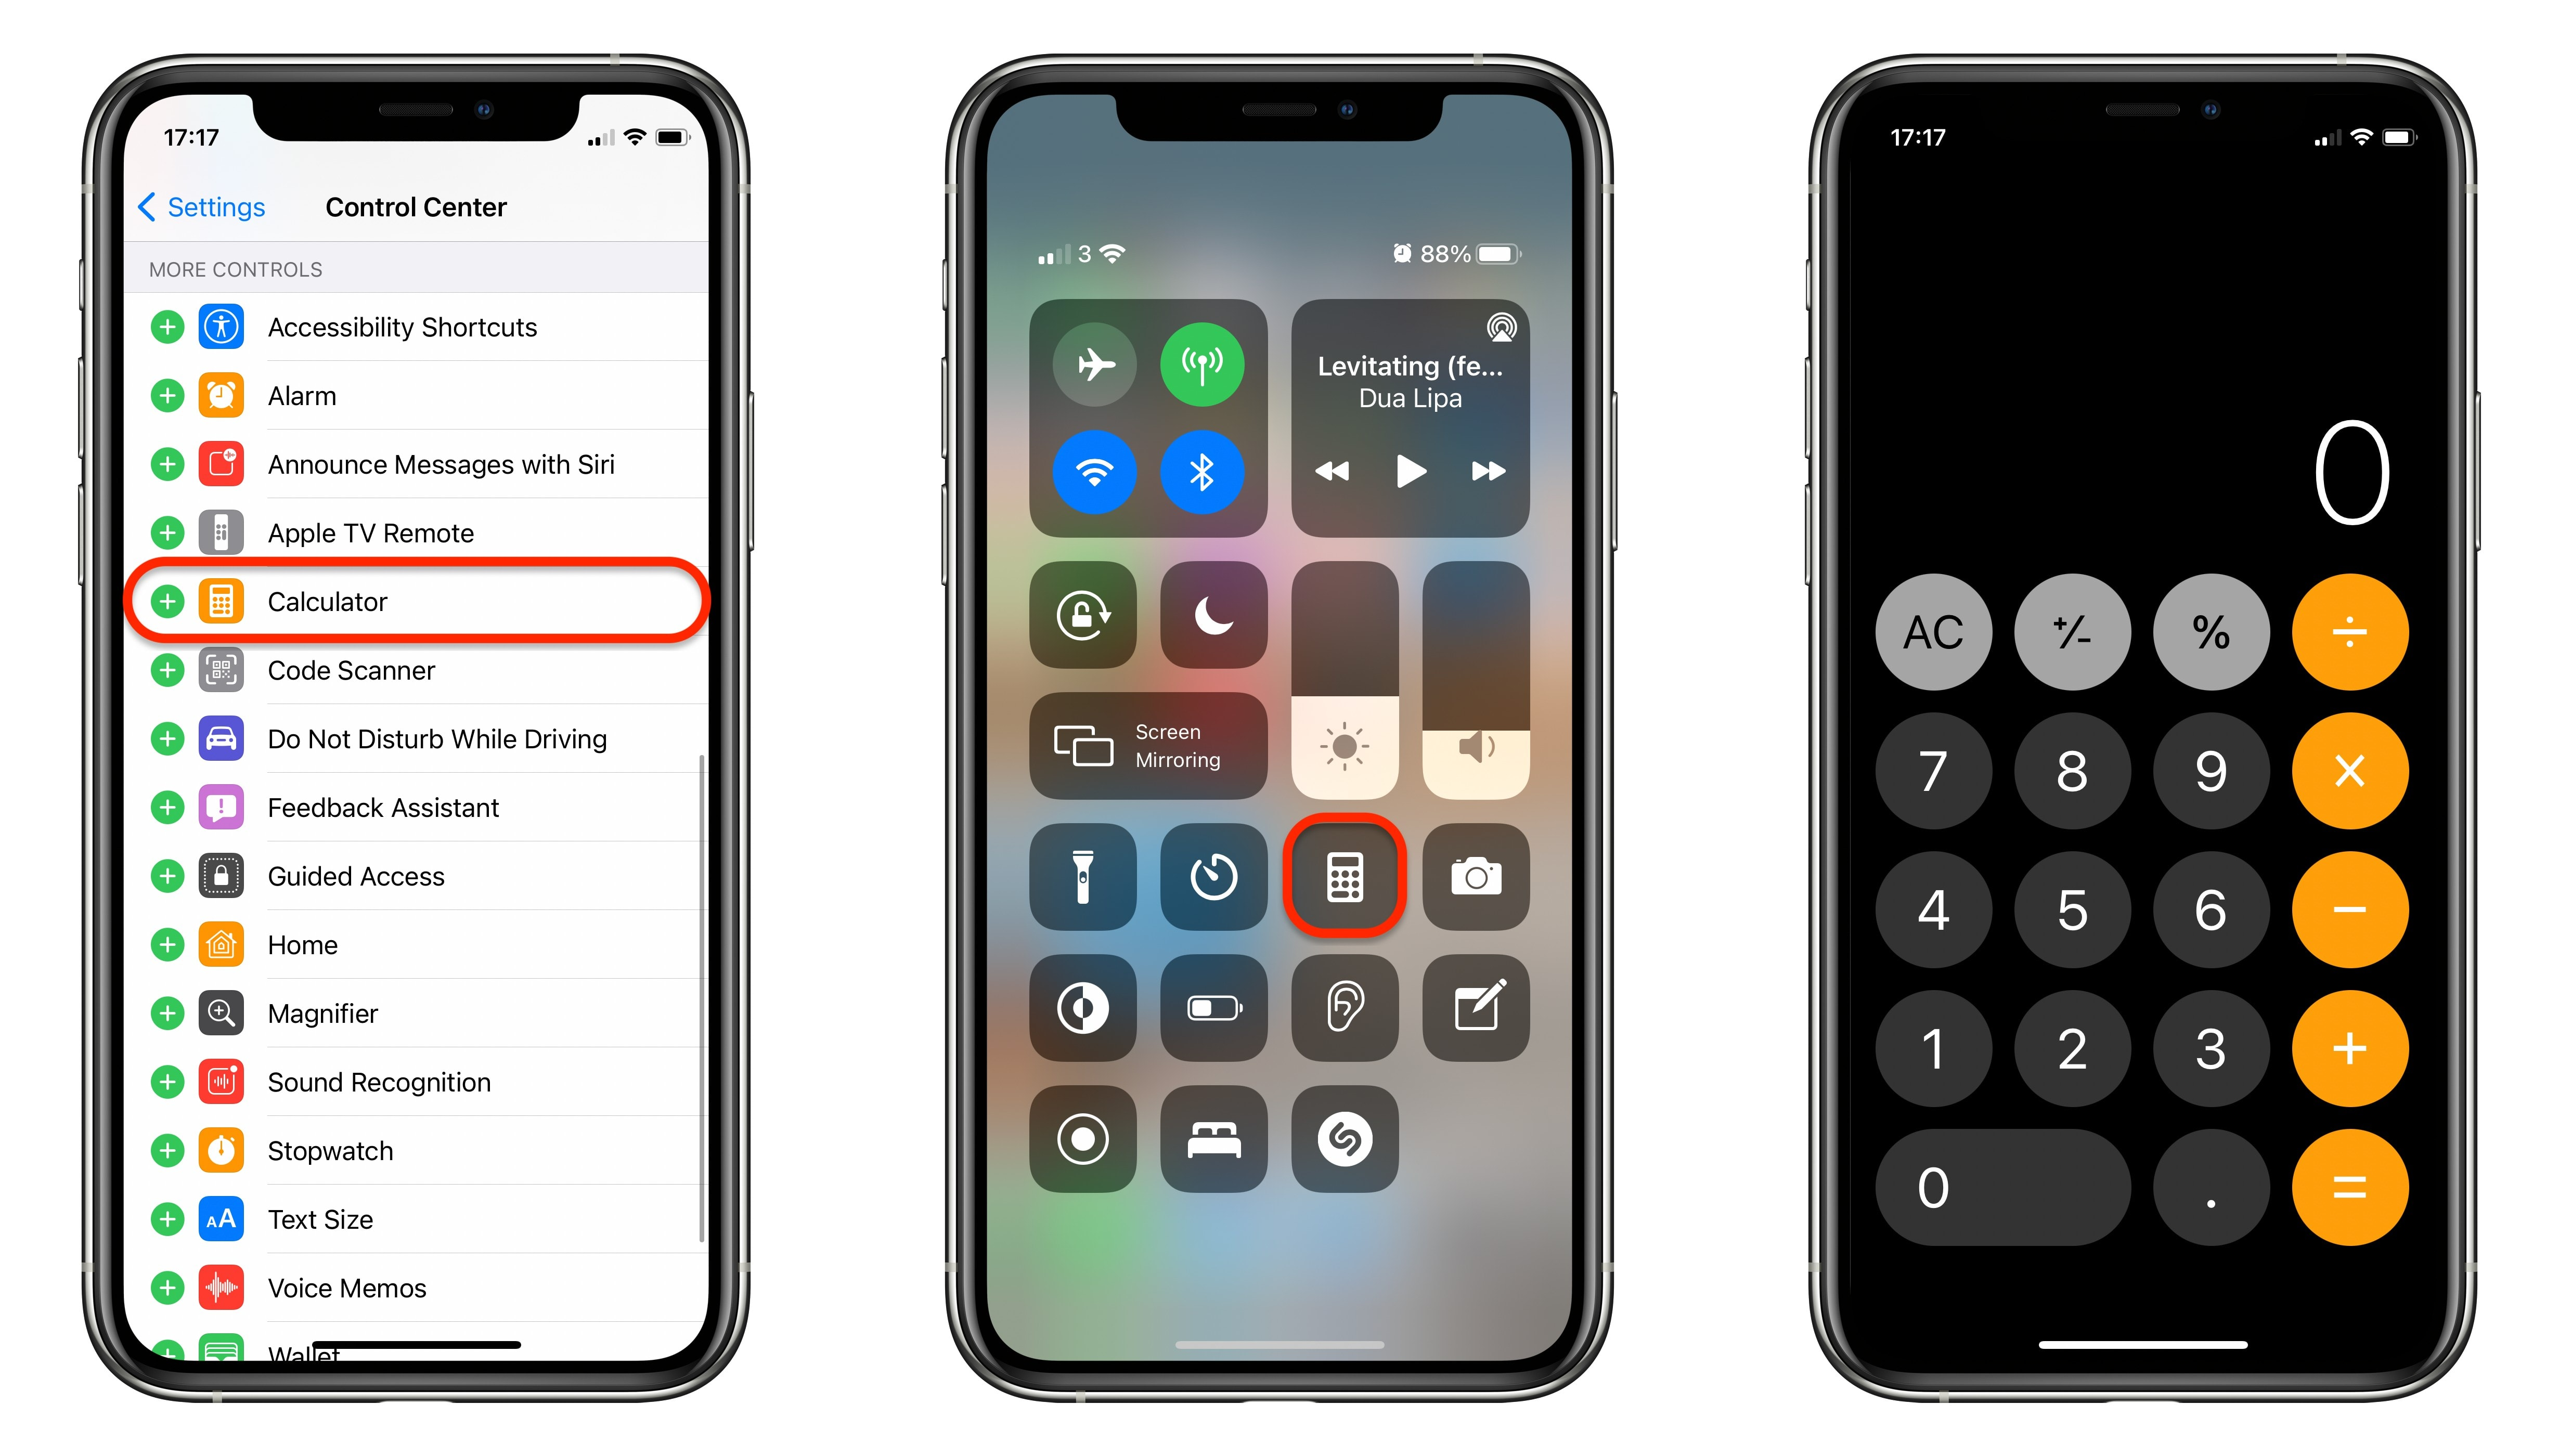 Add the Calculator app to Control Center